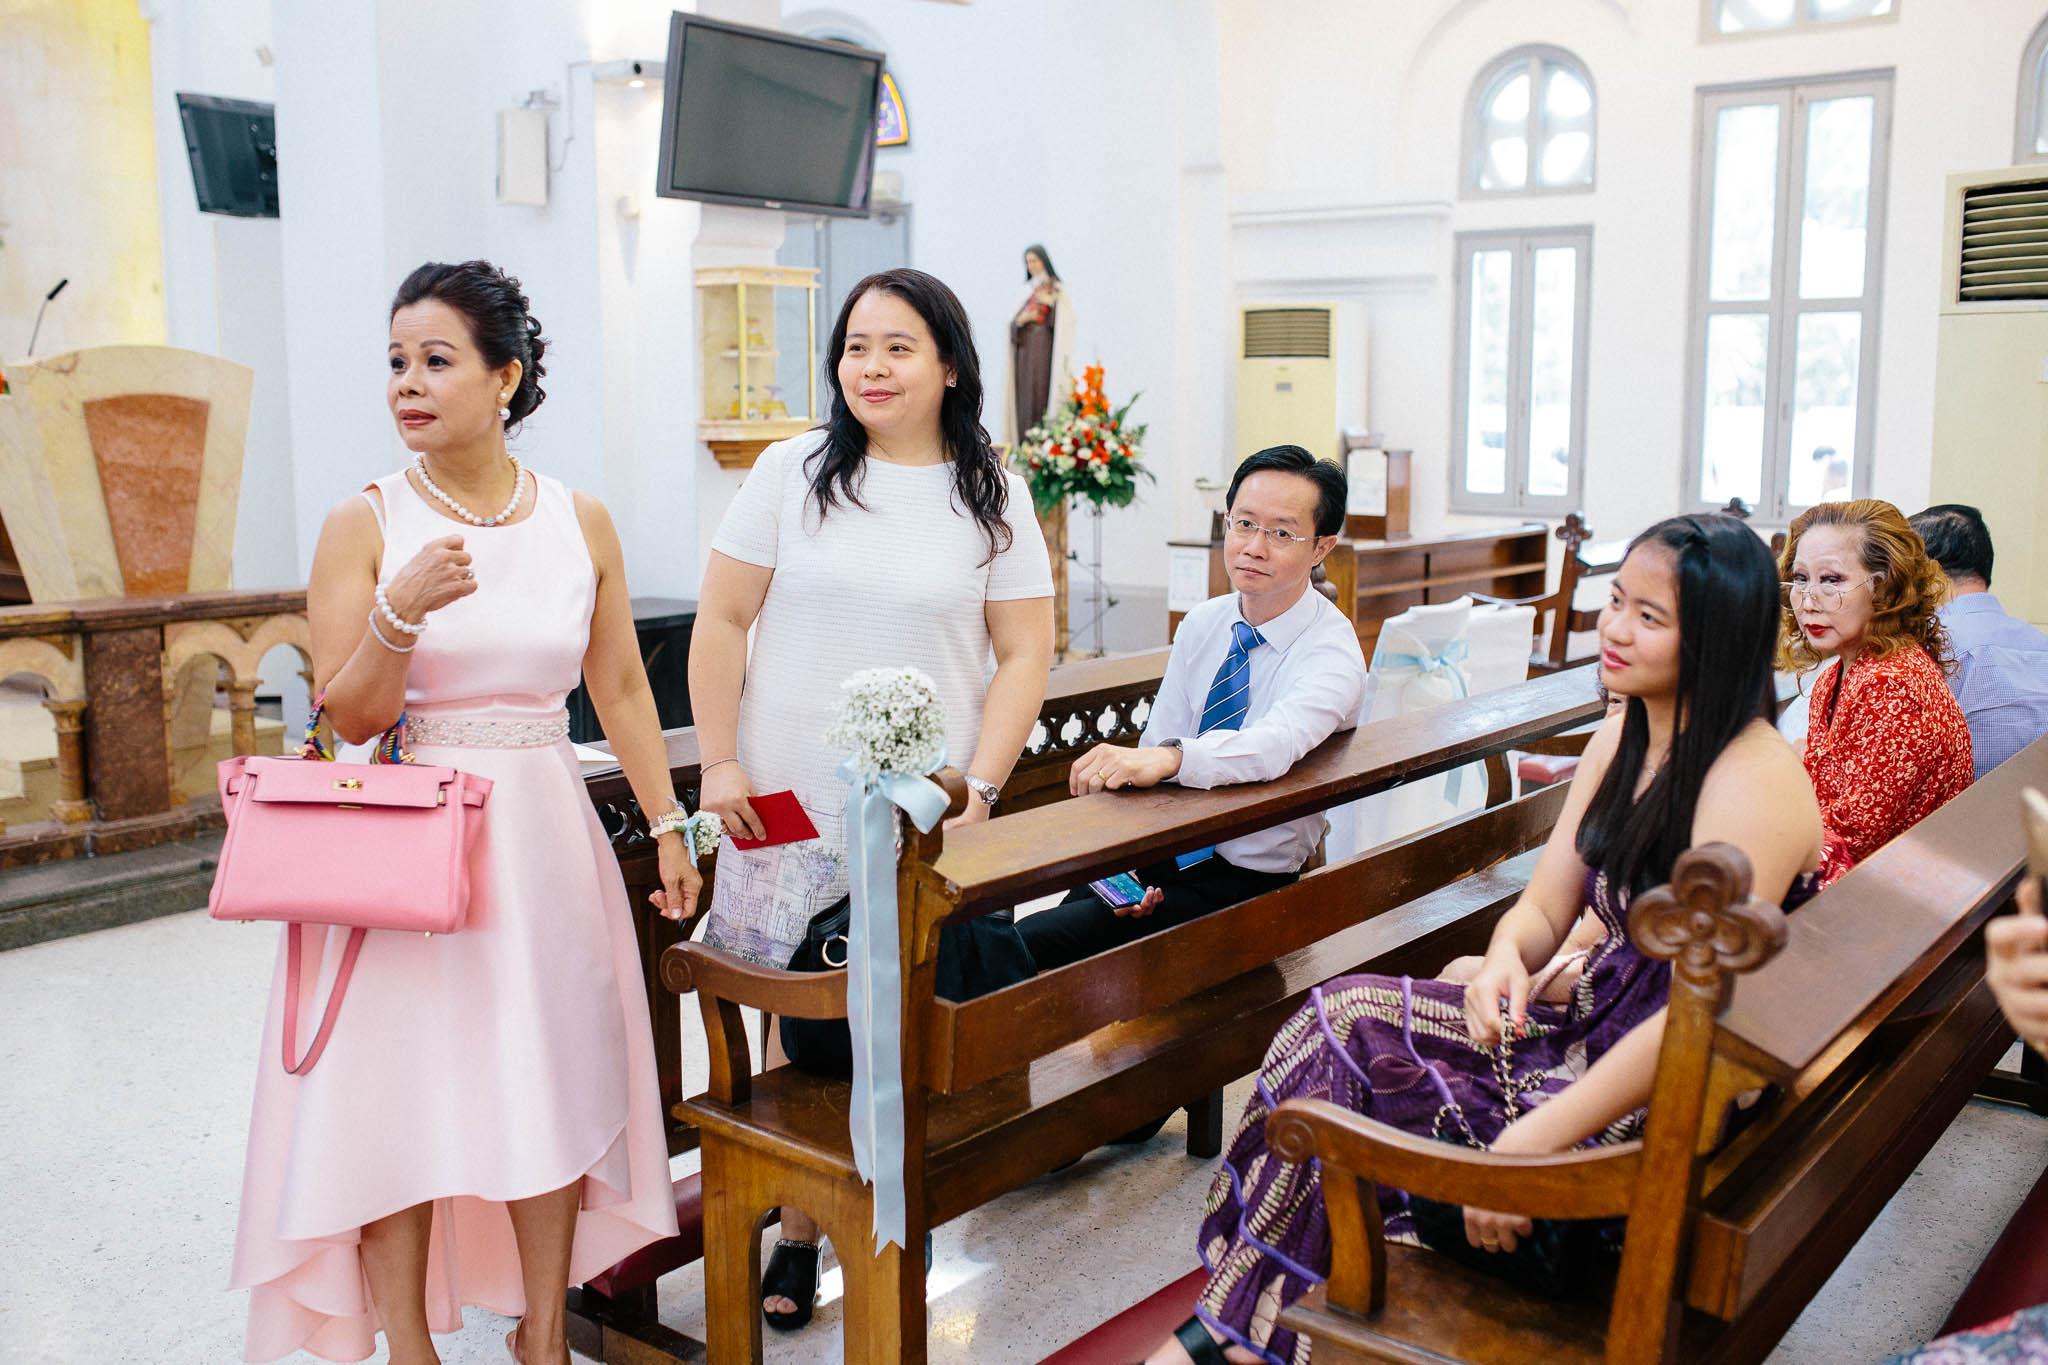 singapore-wedding-photographer-malay-indian-pre-wedding-travel-wmt-2015-jeremy-larissa-49.jpg